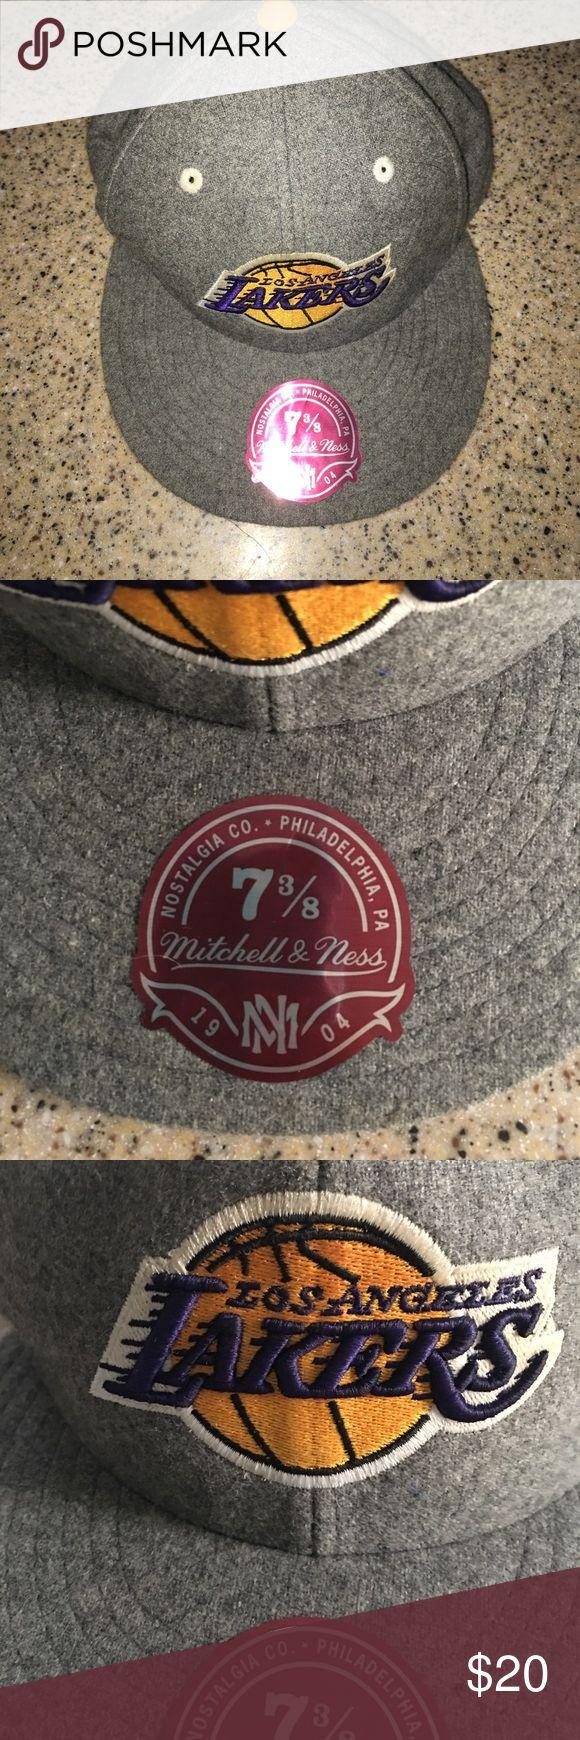 Mitchell & Ness LA Lakers Hat 7 3/8 Gray and Purple Mitchell & Ness LA Lakers Hat size 7 3/8 Mitchell & Ness Accessories Hats